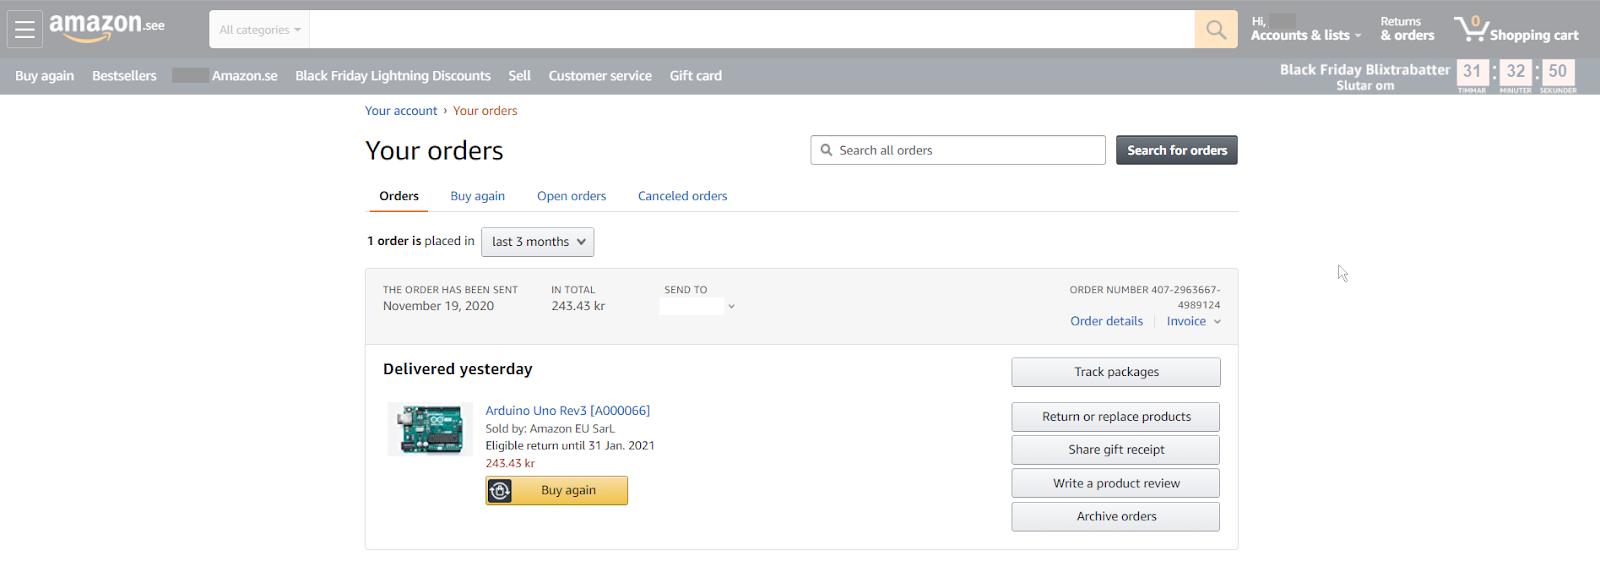 Amazon - Order List